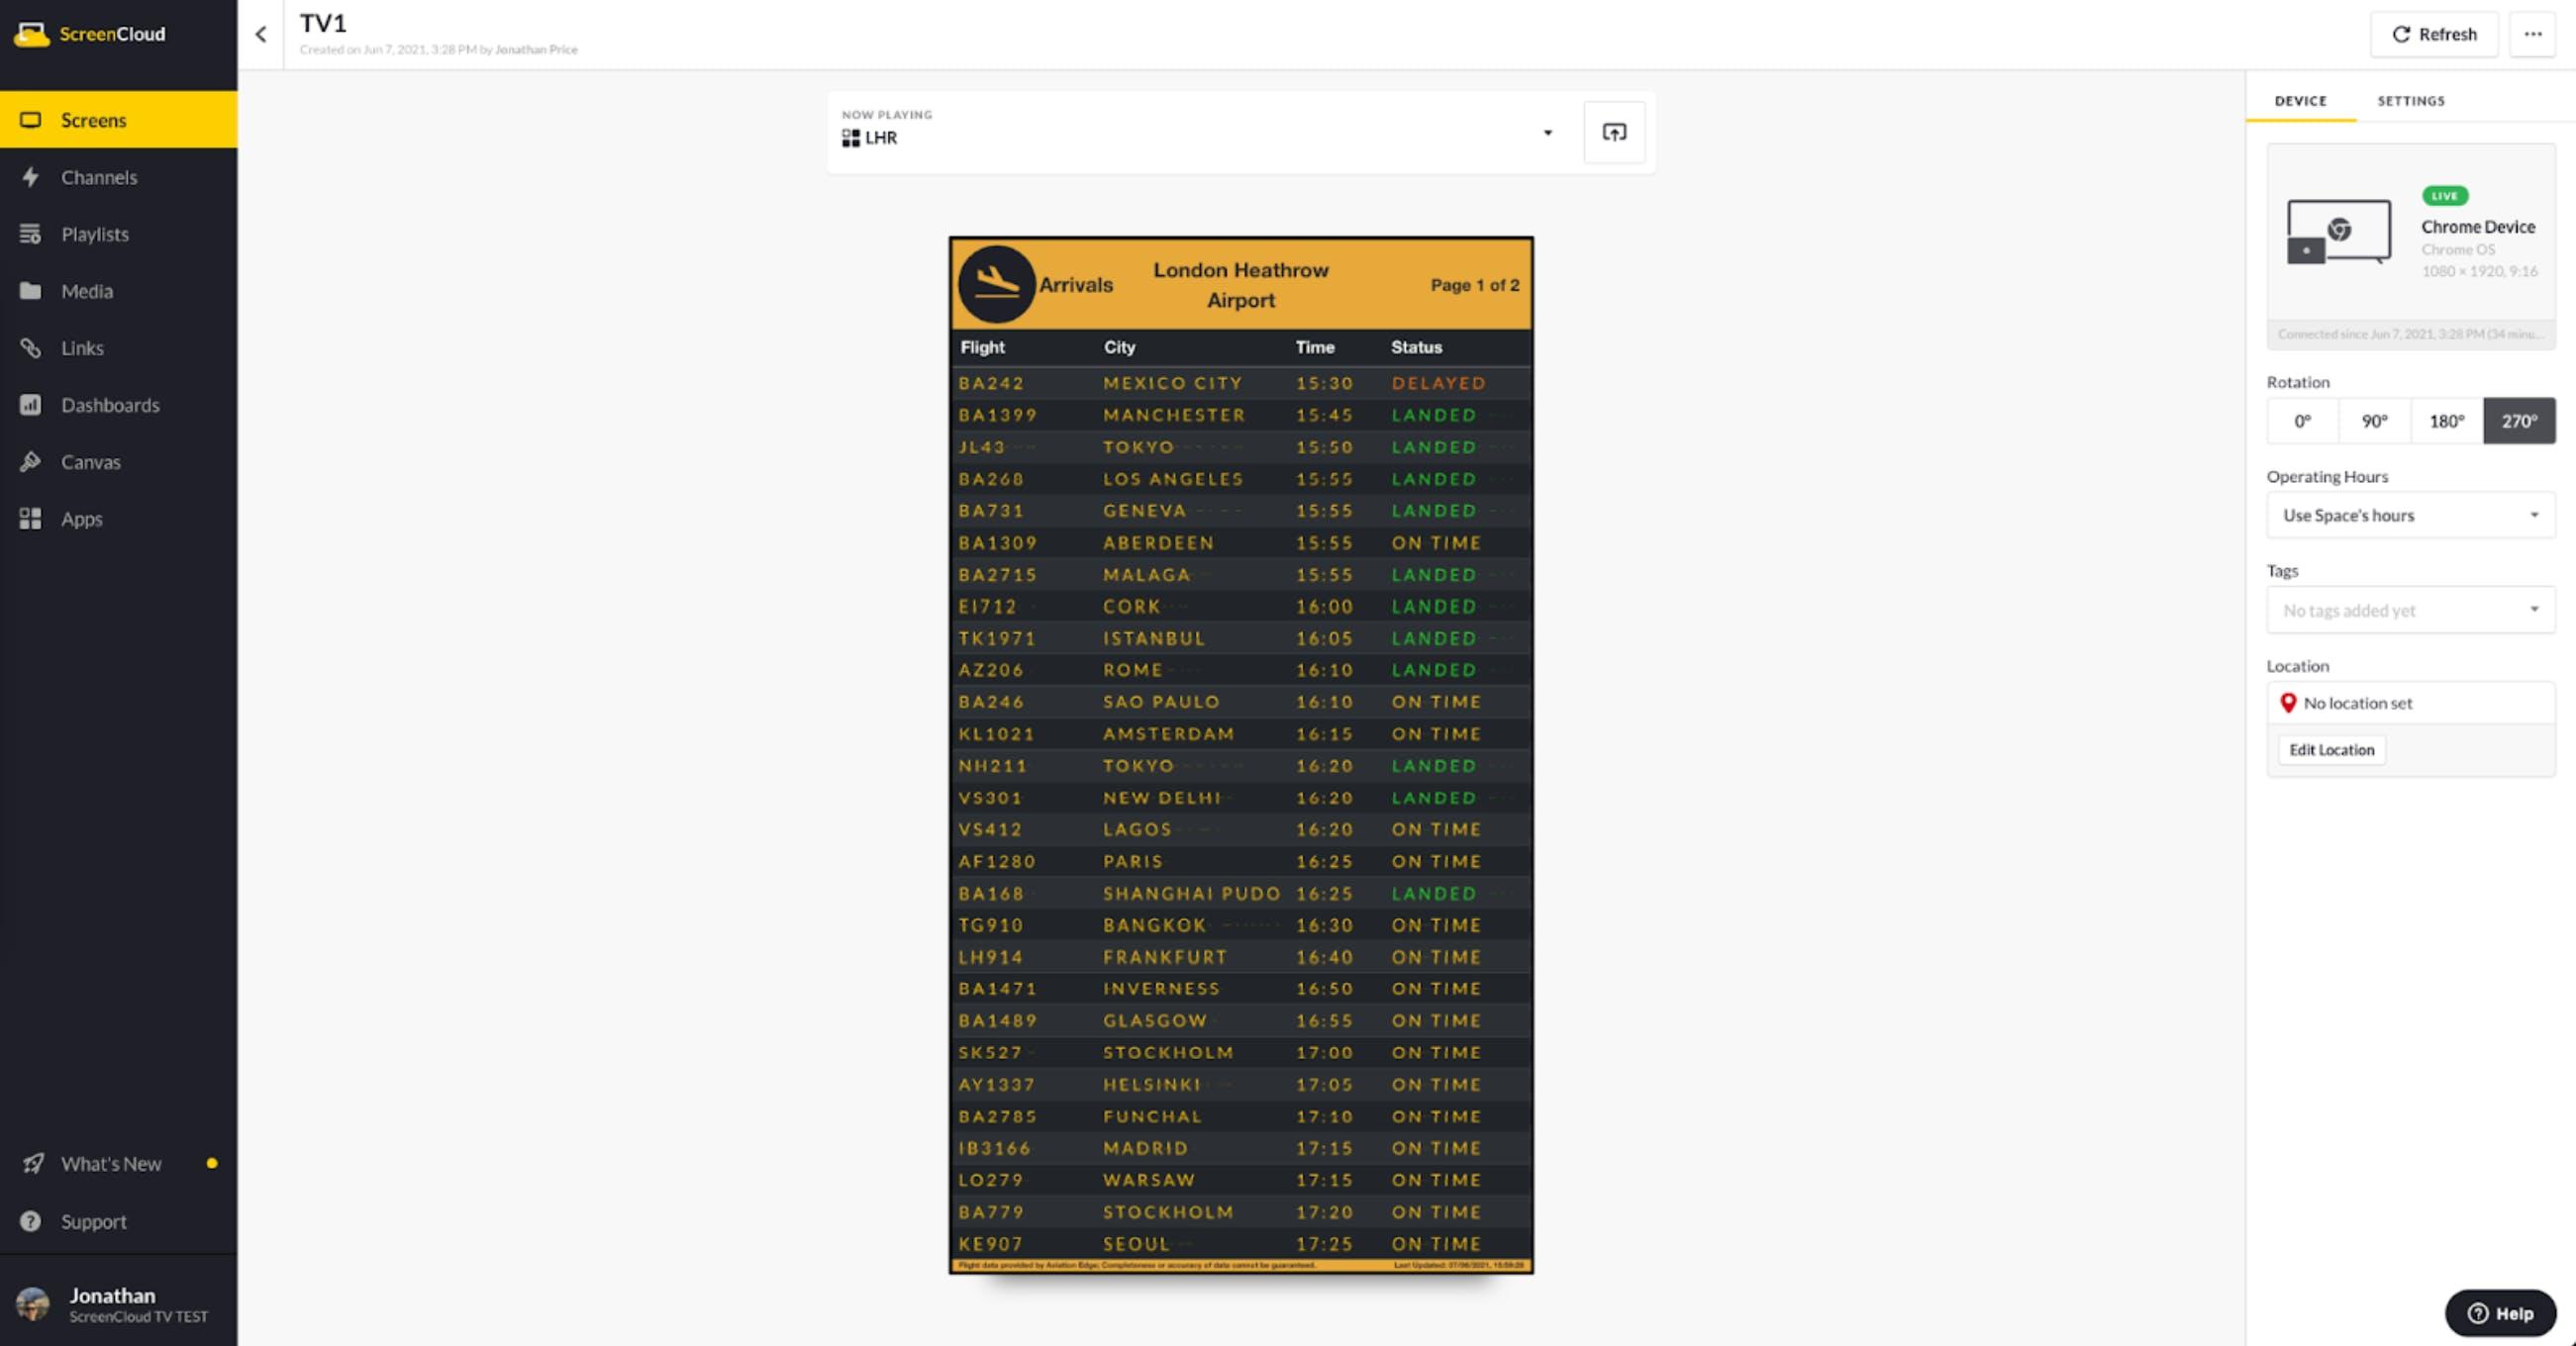 ScreenCloud Flight Schedule App Guide - Portrait Mode.png